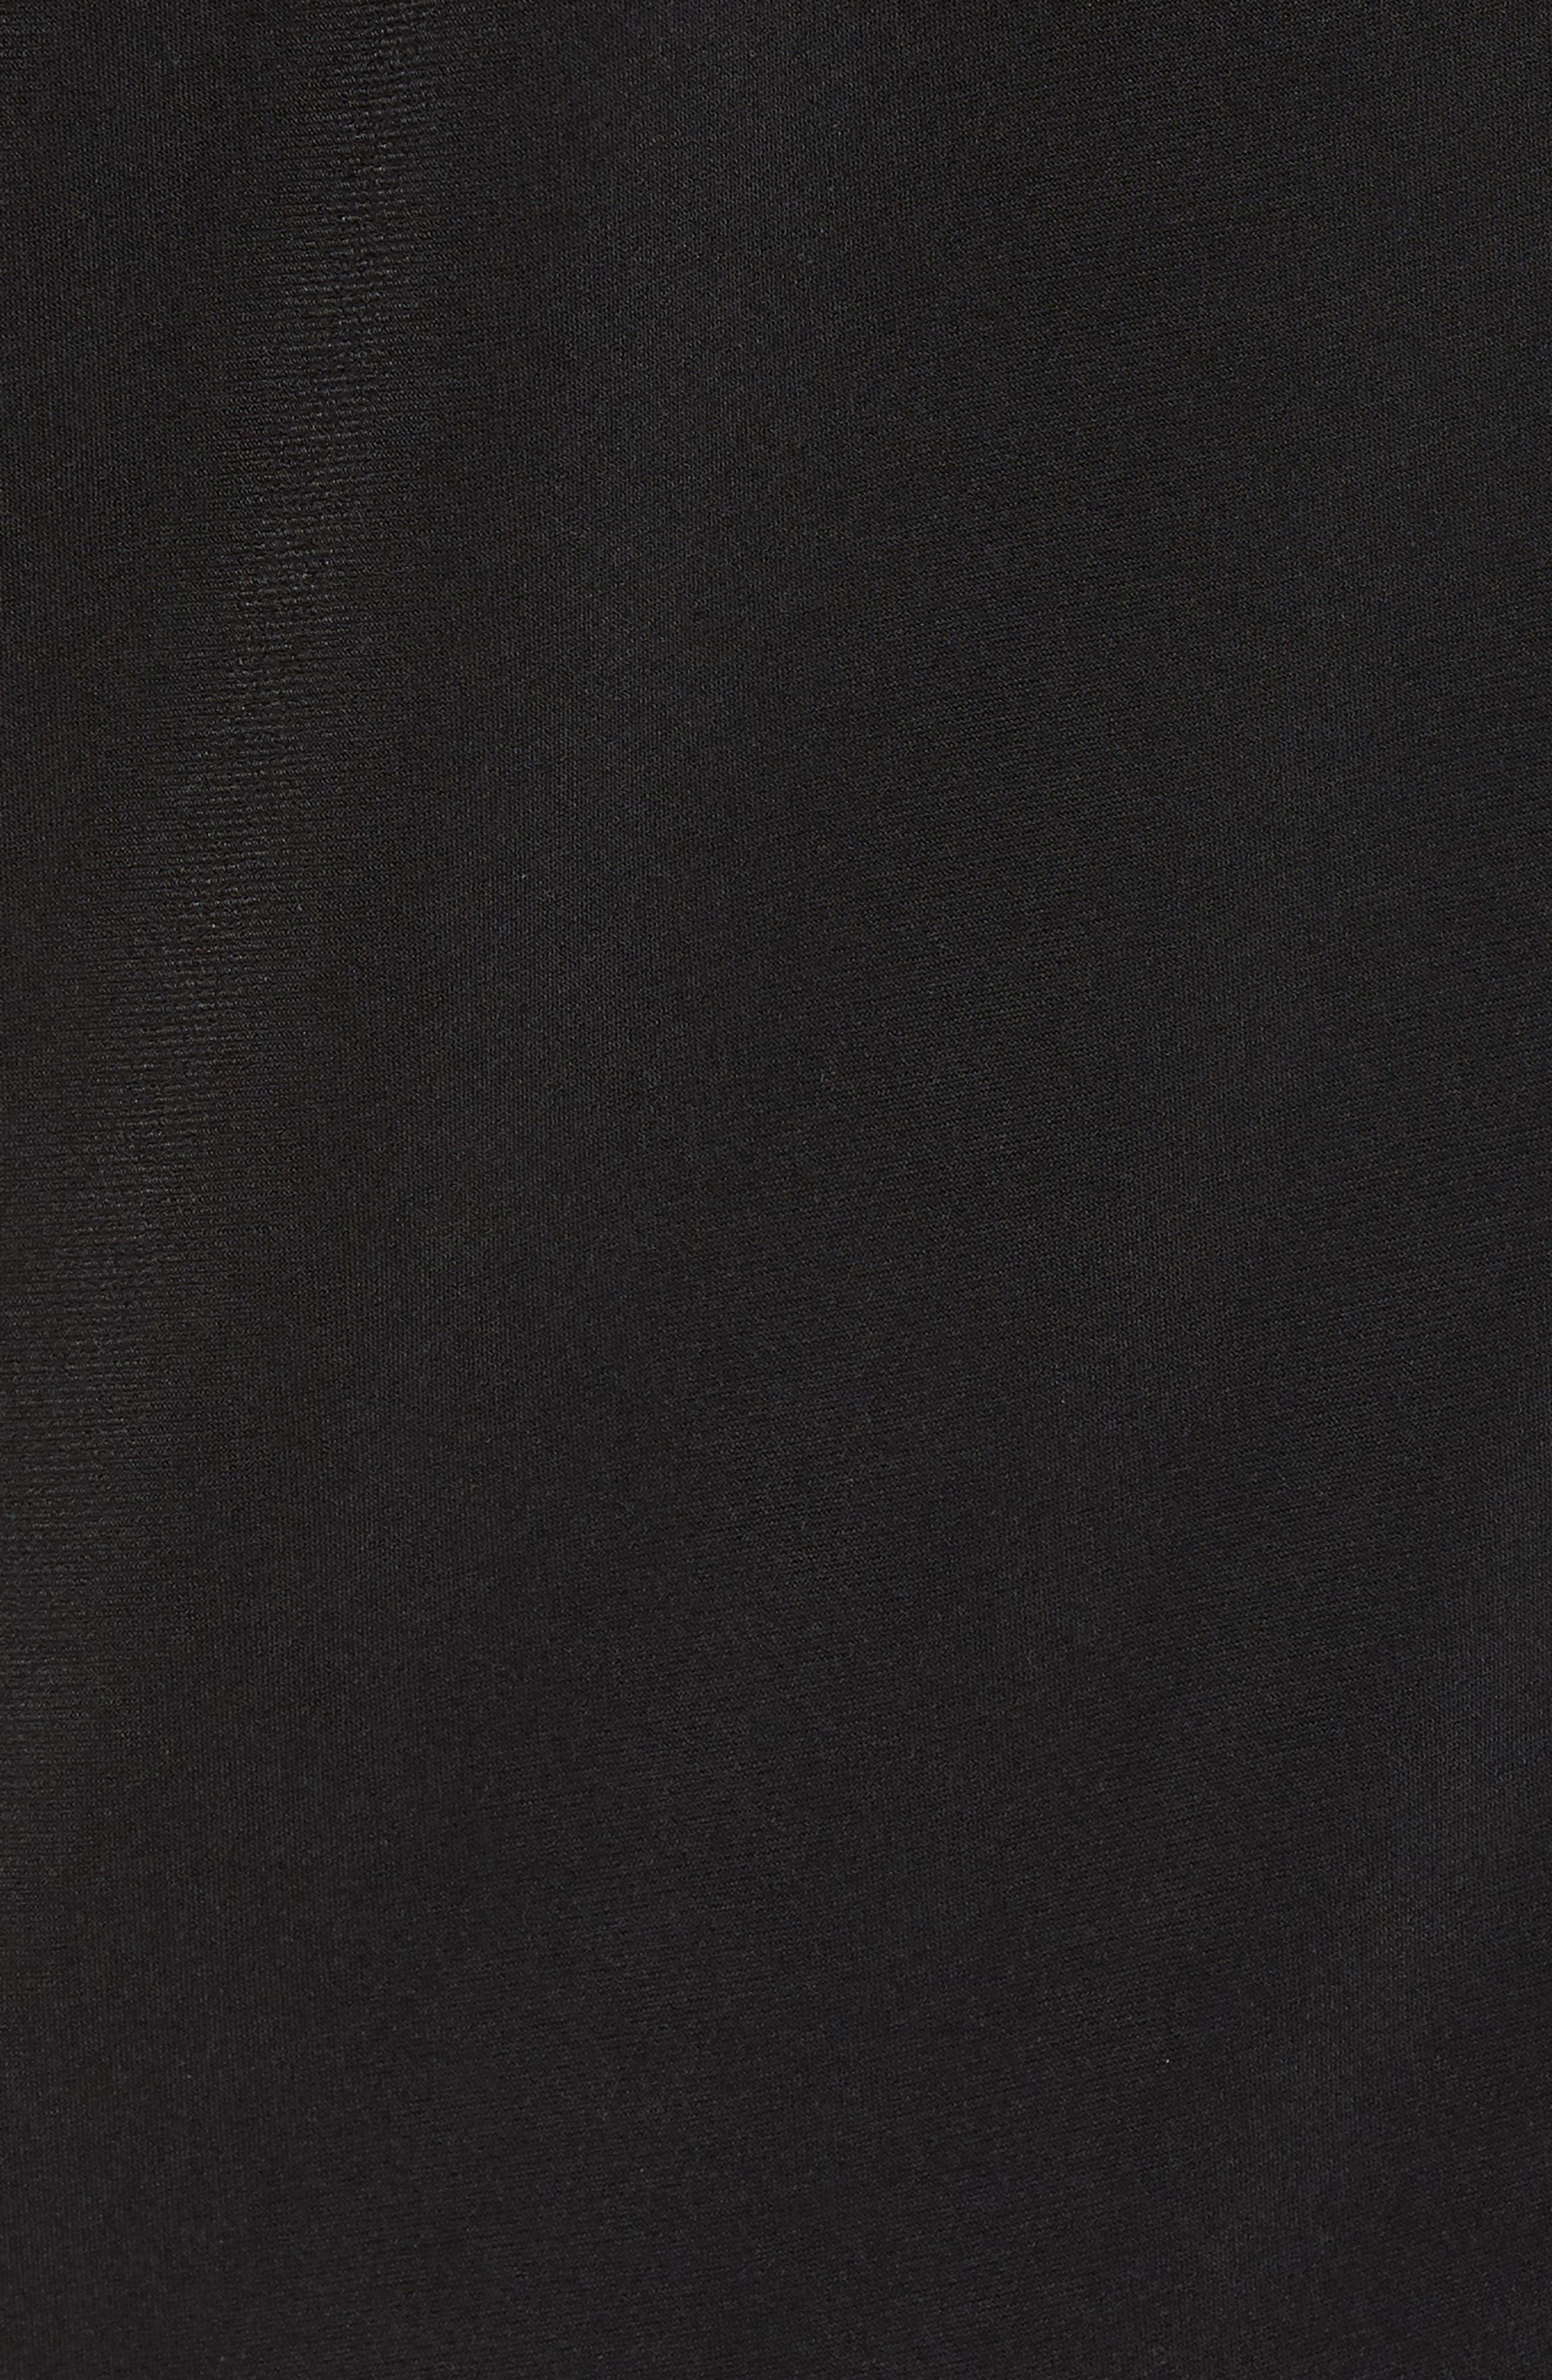 Grommet Neck Shirred Top,                             Alternate thumbnail 5, color,                             BLACK